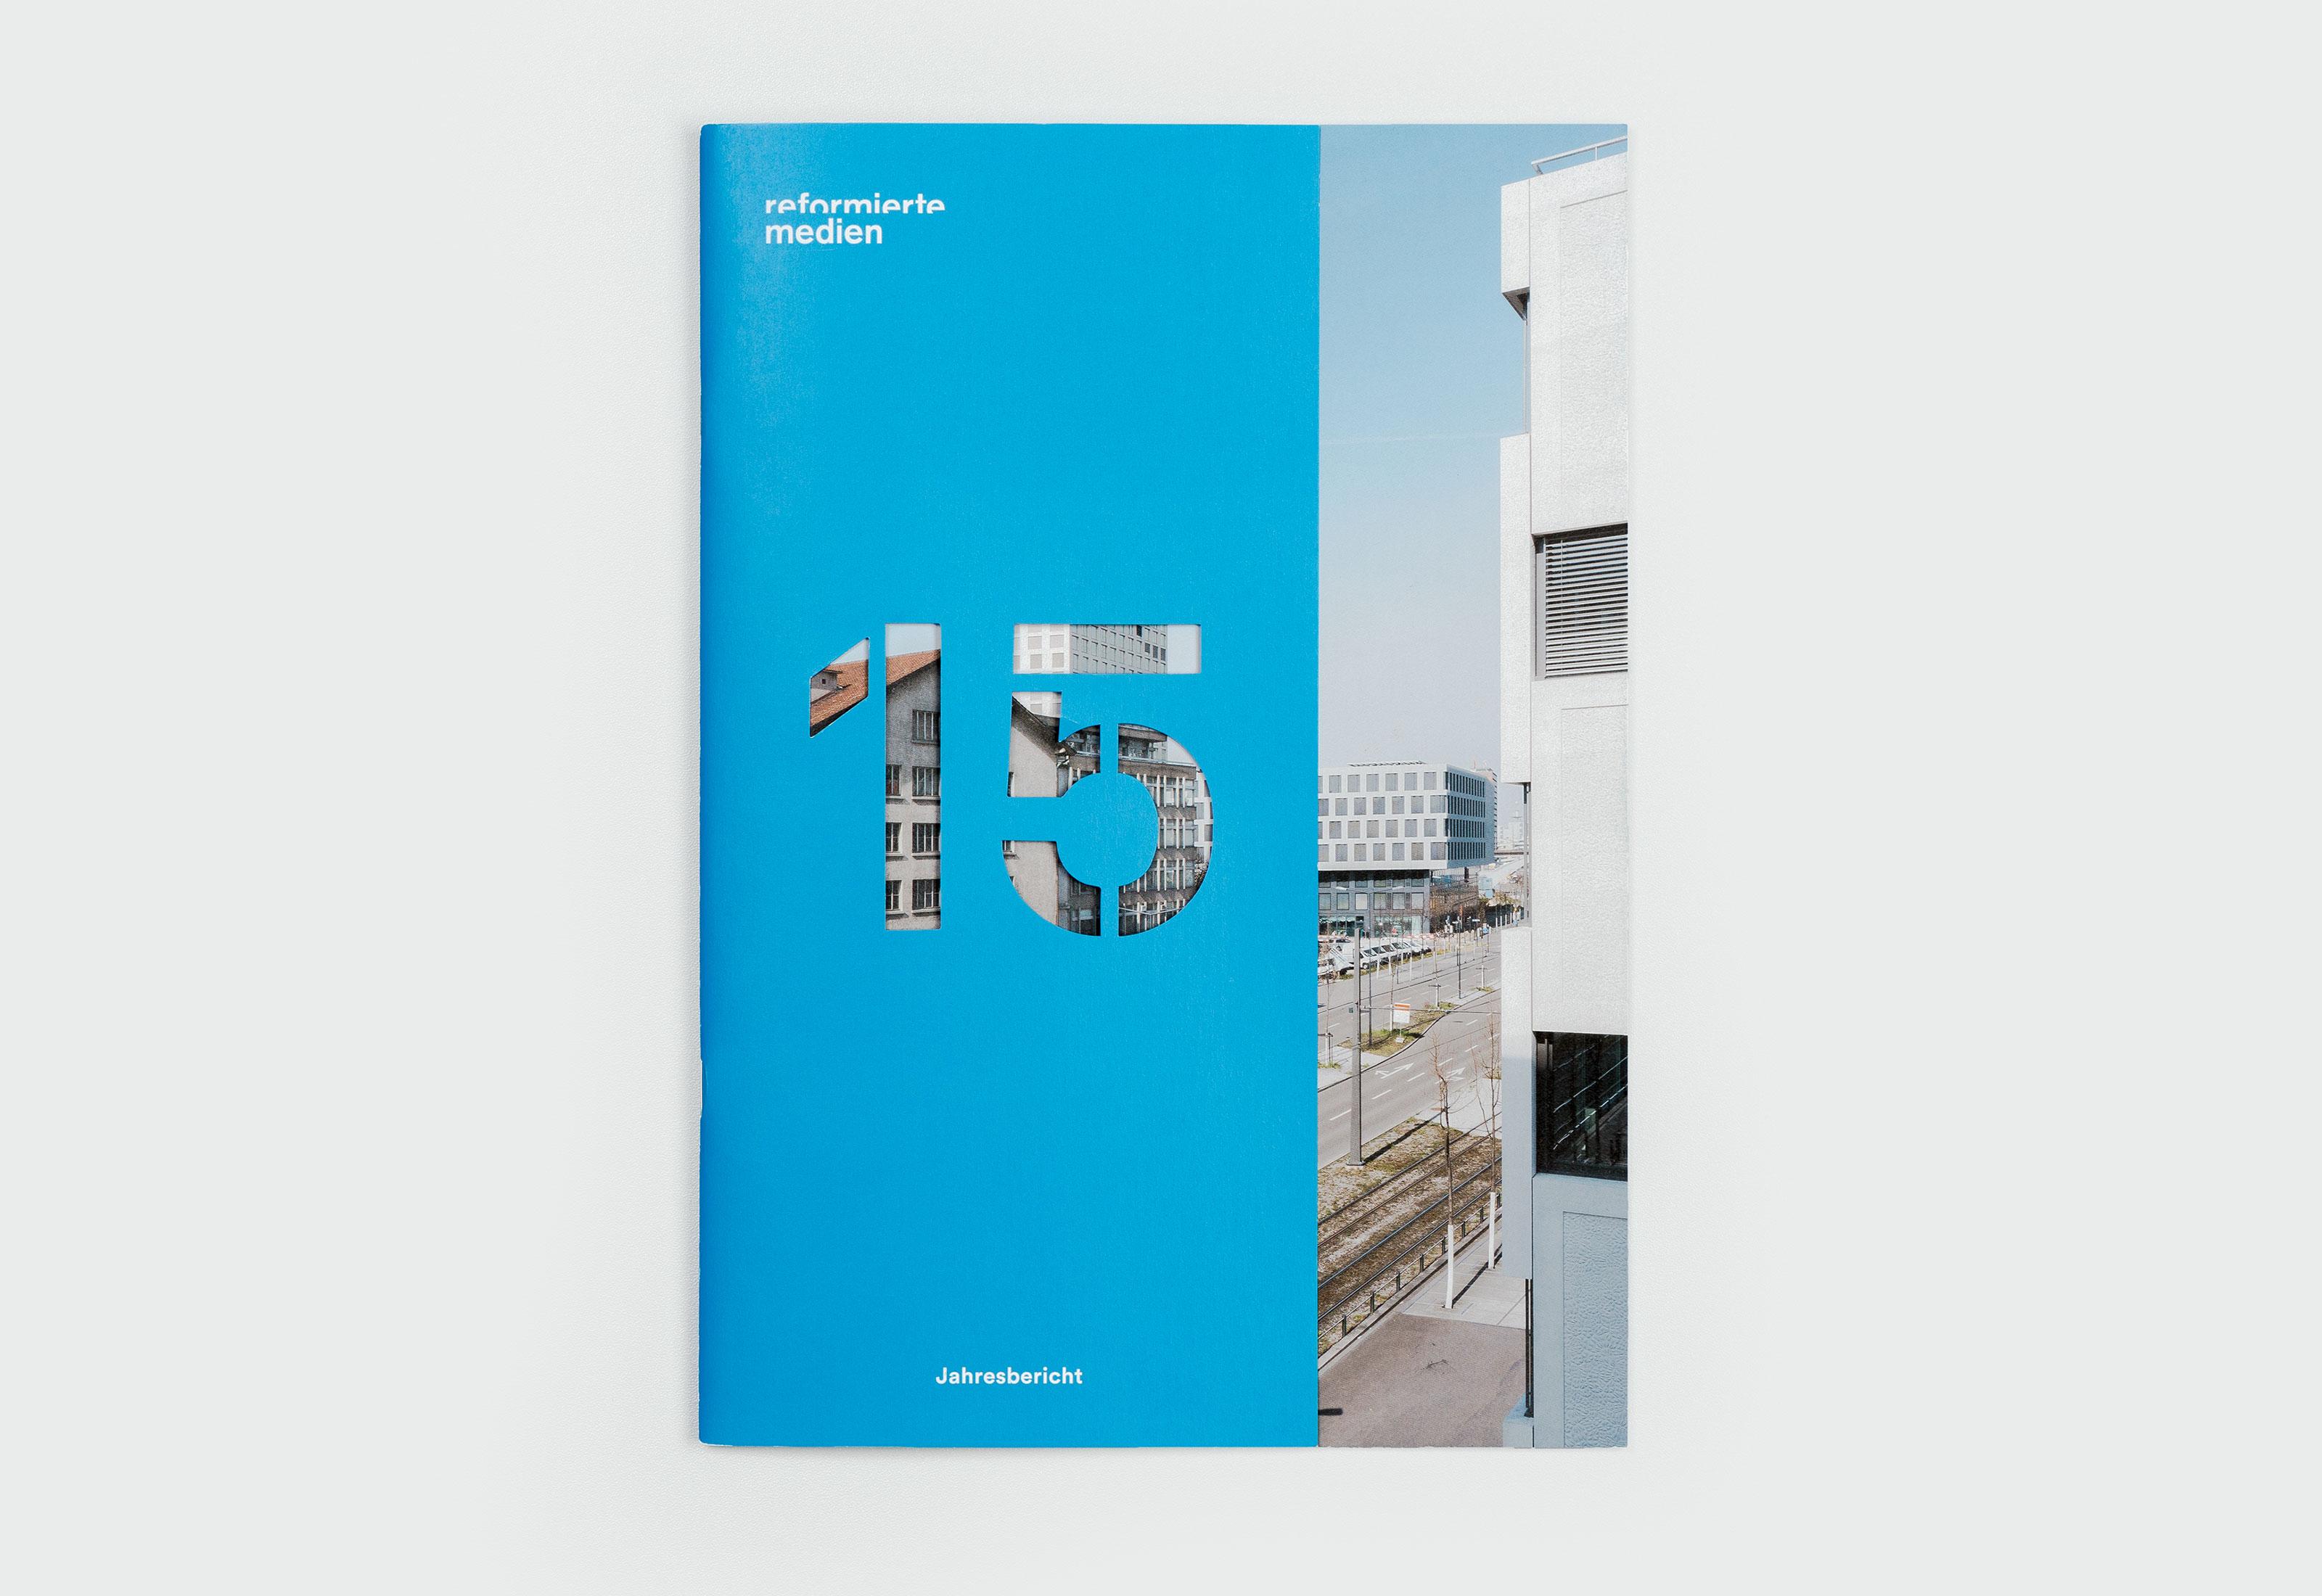 Reformierte Medien – Jahresbericht 2015, cover ©Atelier Pol × Barbara Hess